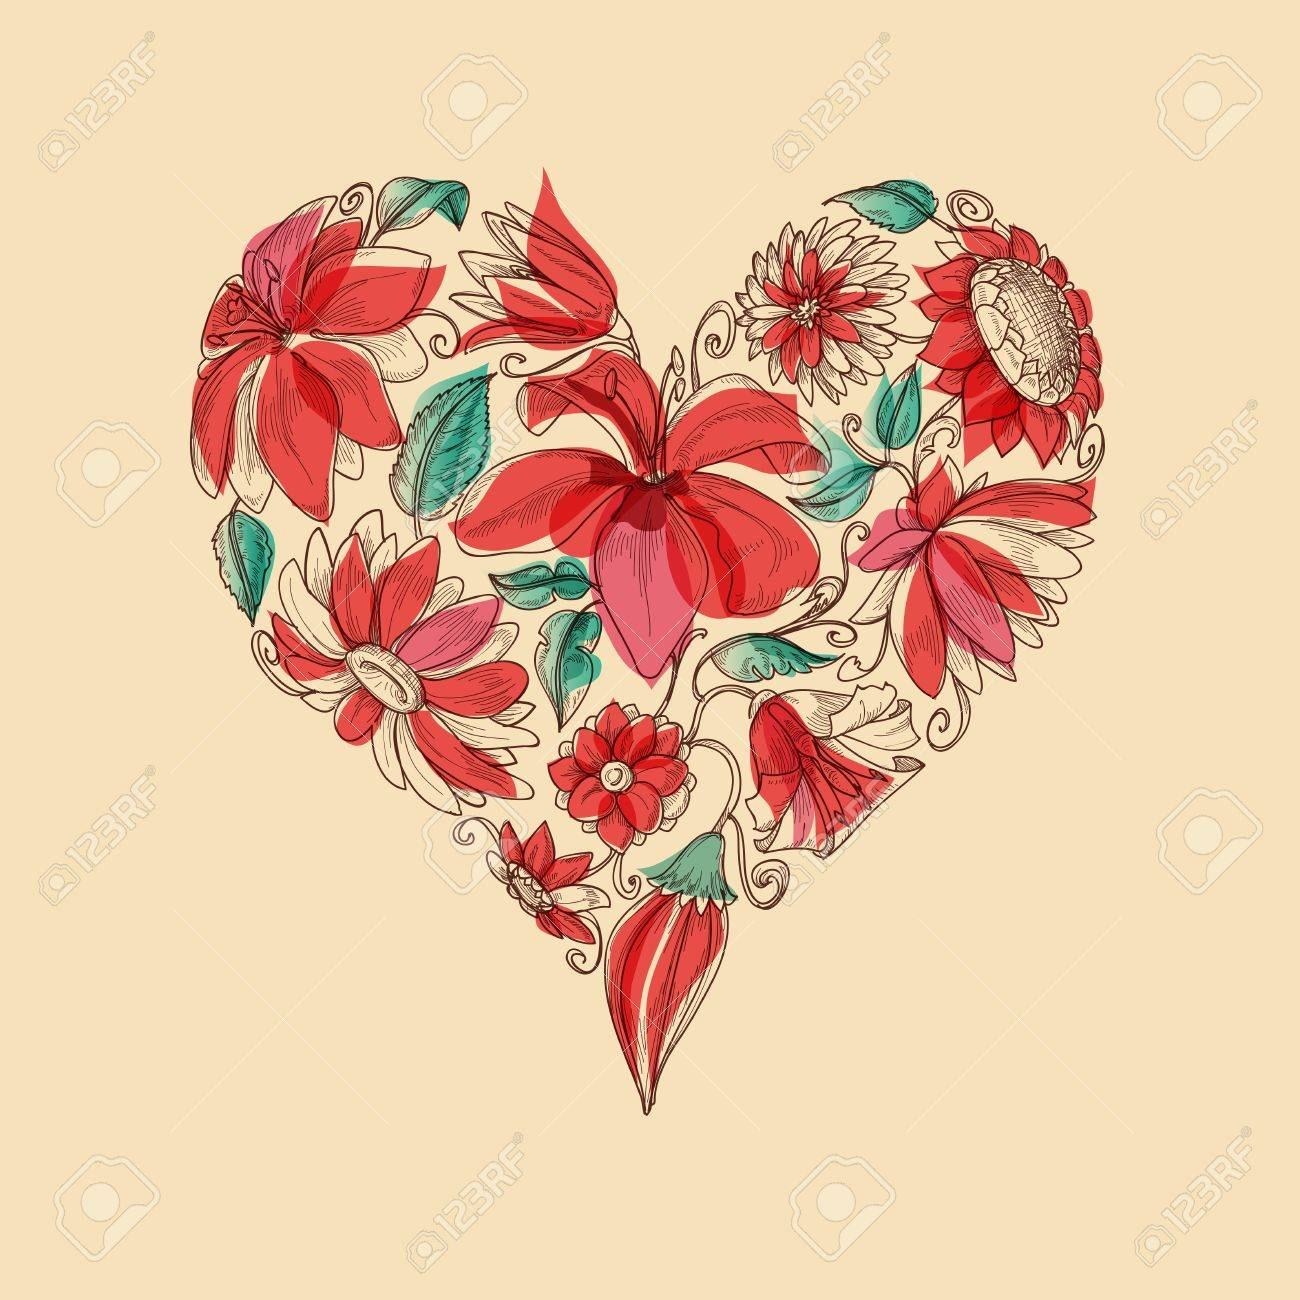 retro heart of flowers